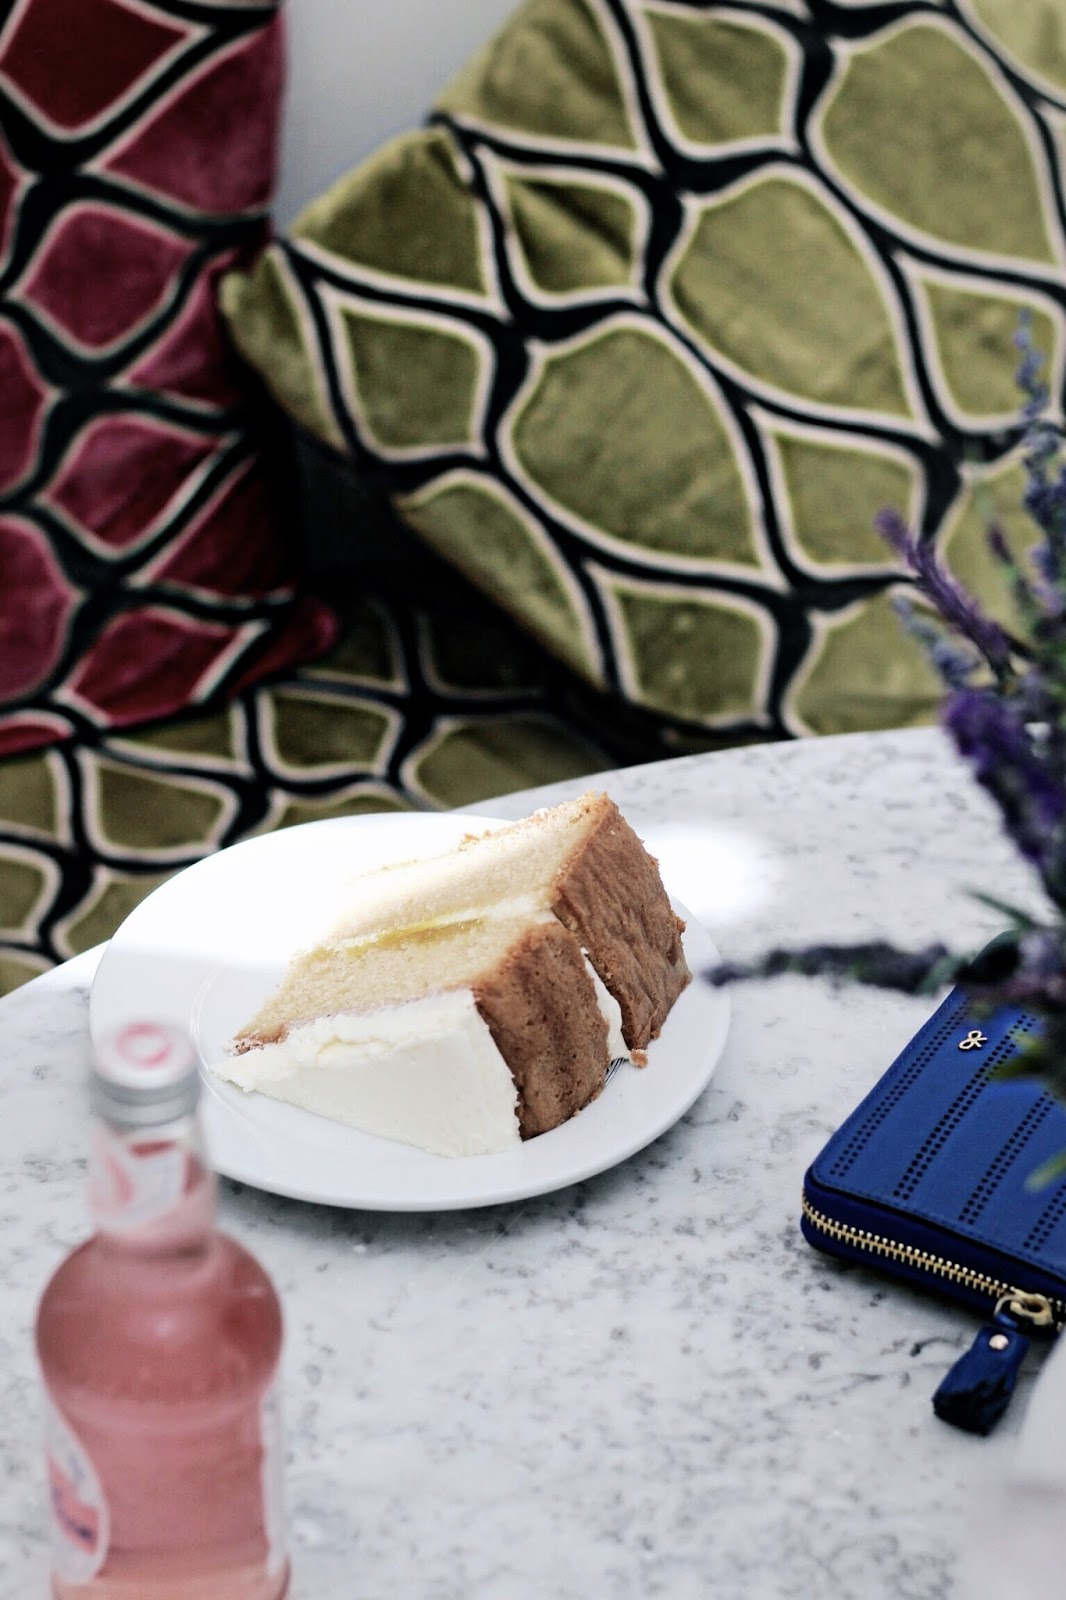 Large slice of lemon cake at cafe